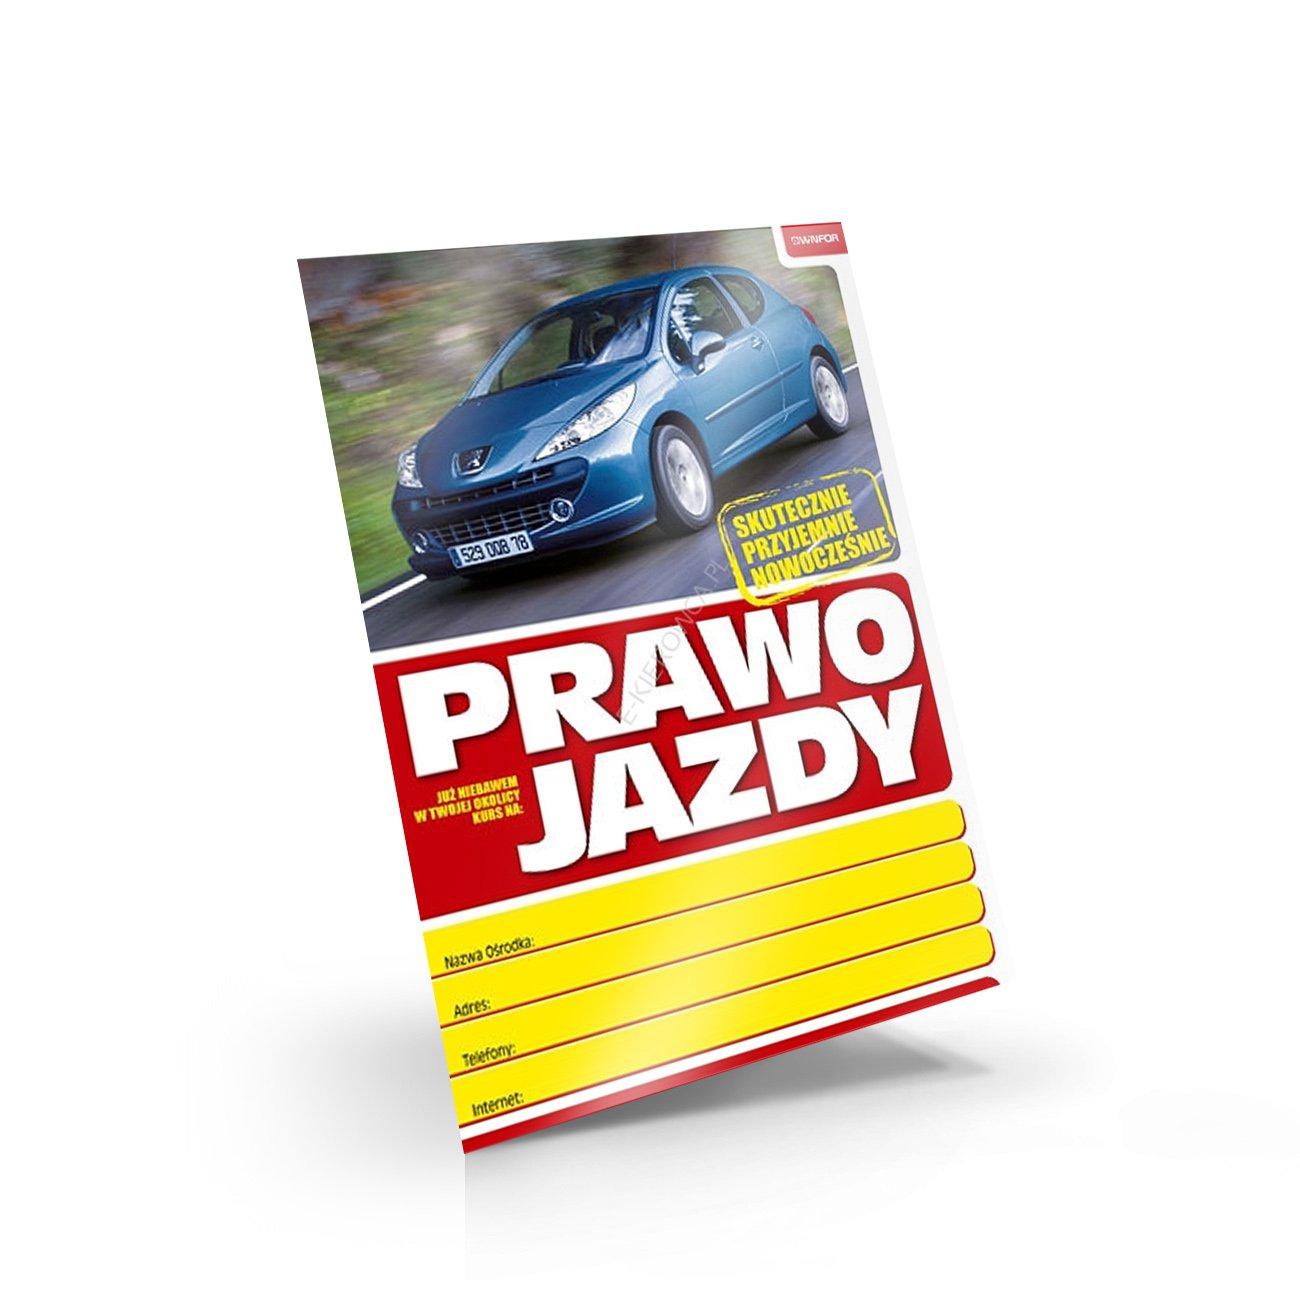 plakat reklamowy PRAWO JAZDY